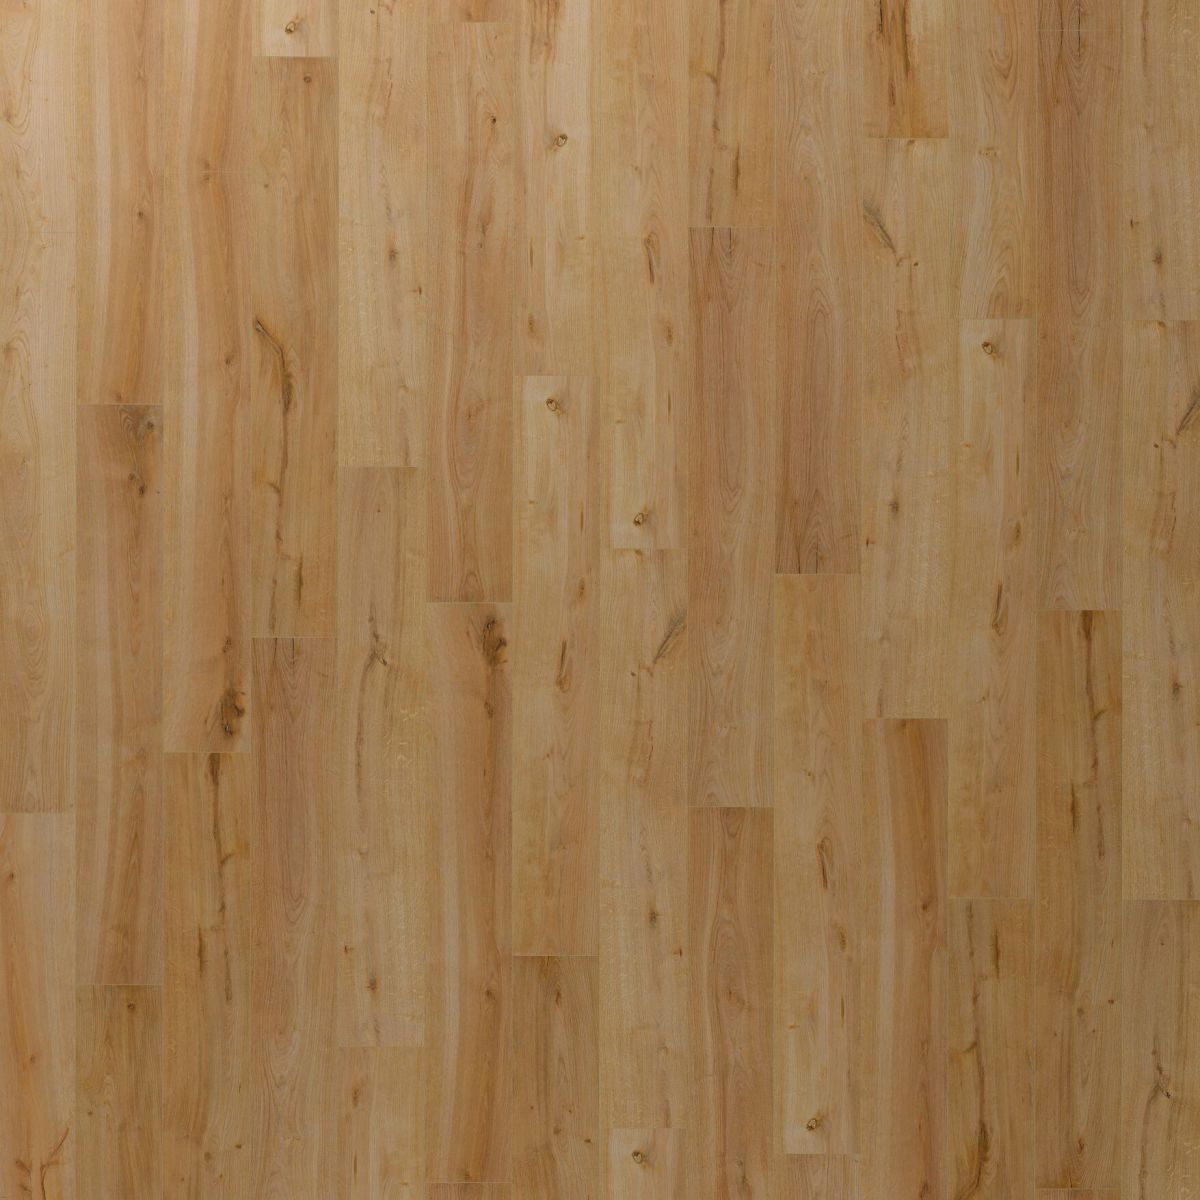 Avatara vloerdelen hout N02 plan